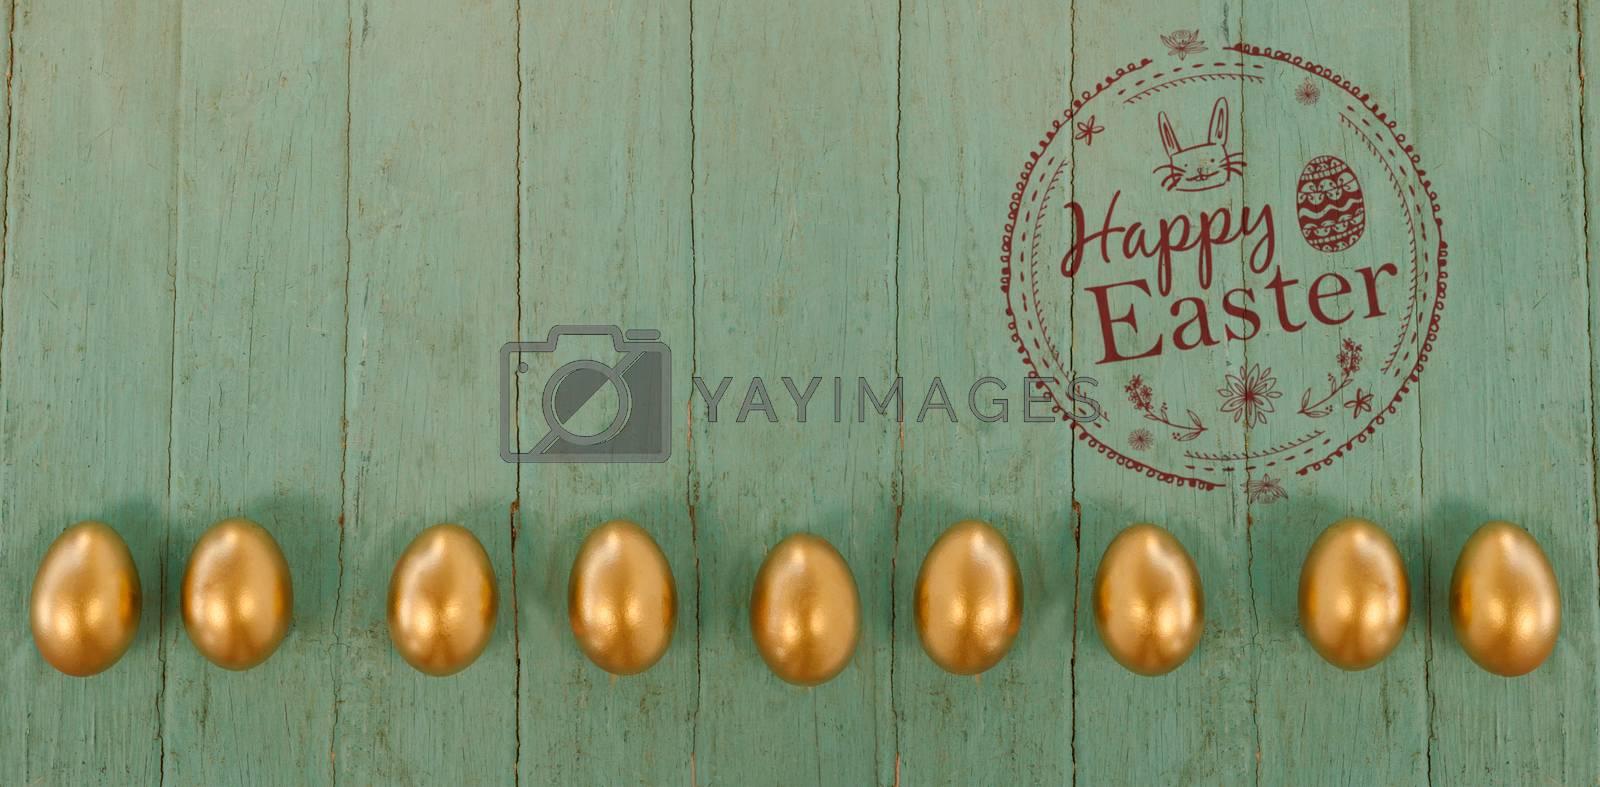 Happy easter logo against golden easter eggs arranged on wooden surface